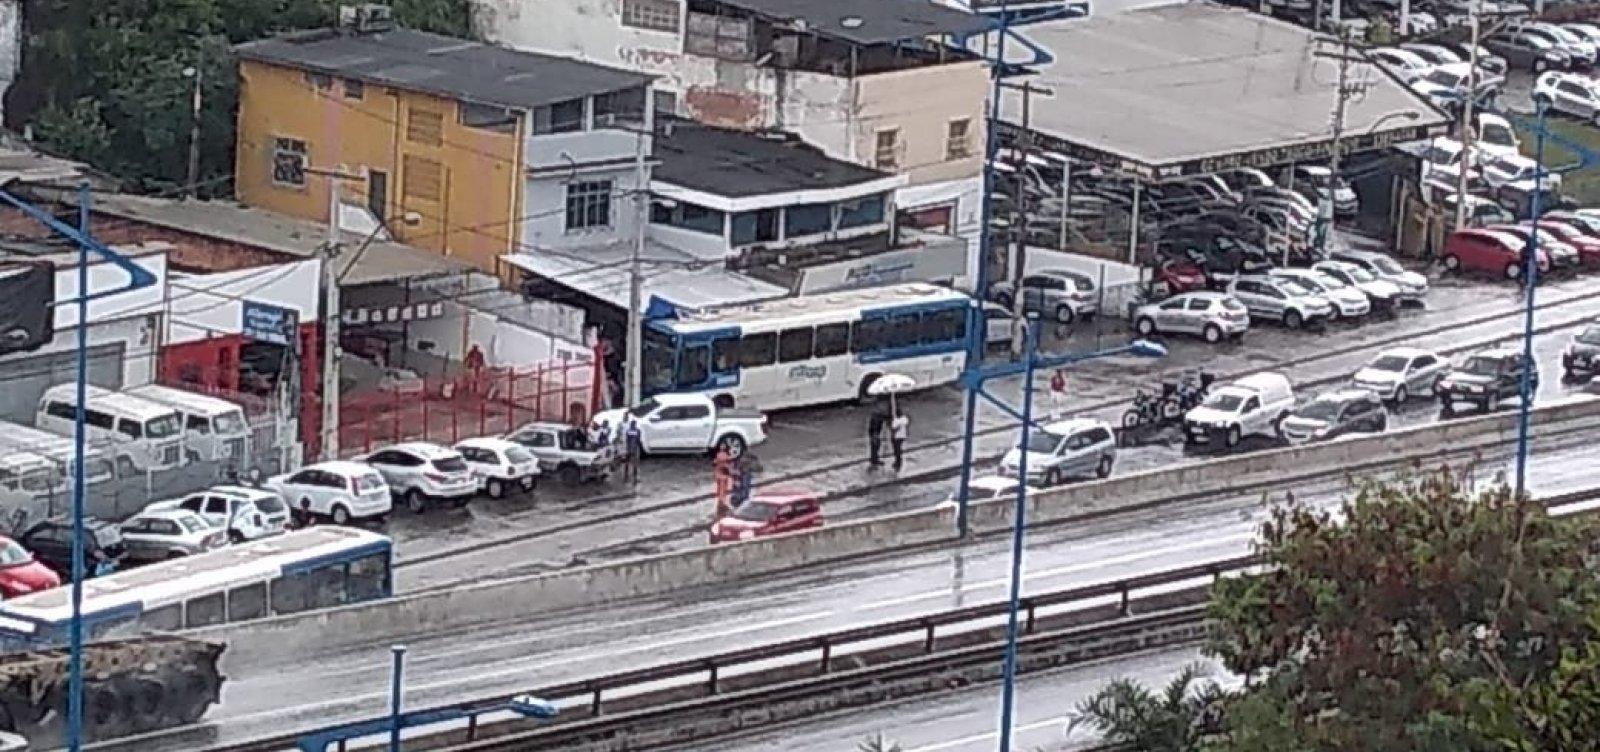 Após ônibus invadir loja, trânsito fica intenso na Heitor Dias